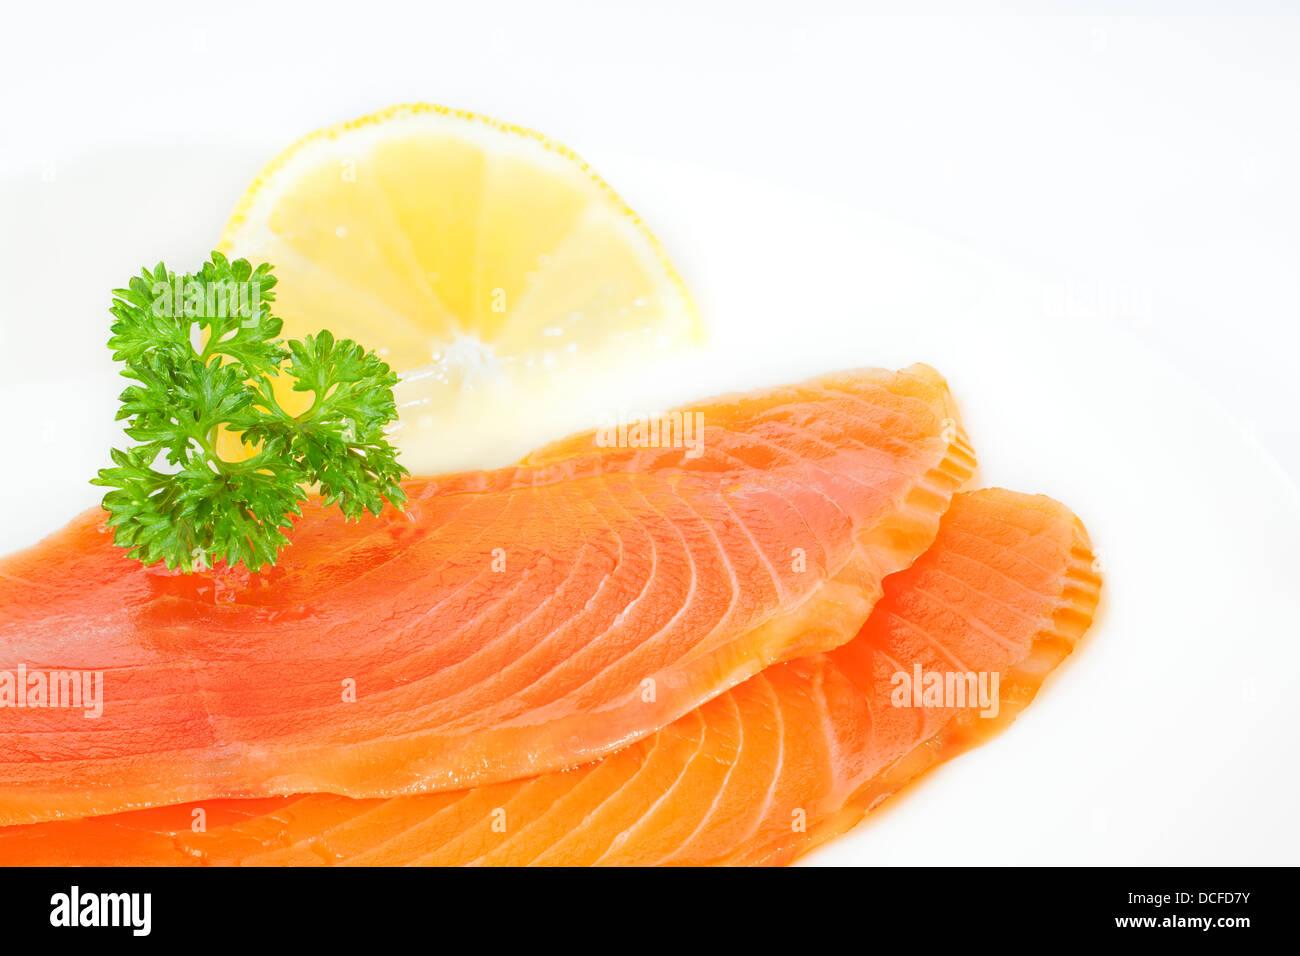 Smoked Salmon - cold smoked salmon on a plate with parsley and lemon. - Stock Image